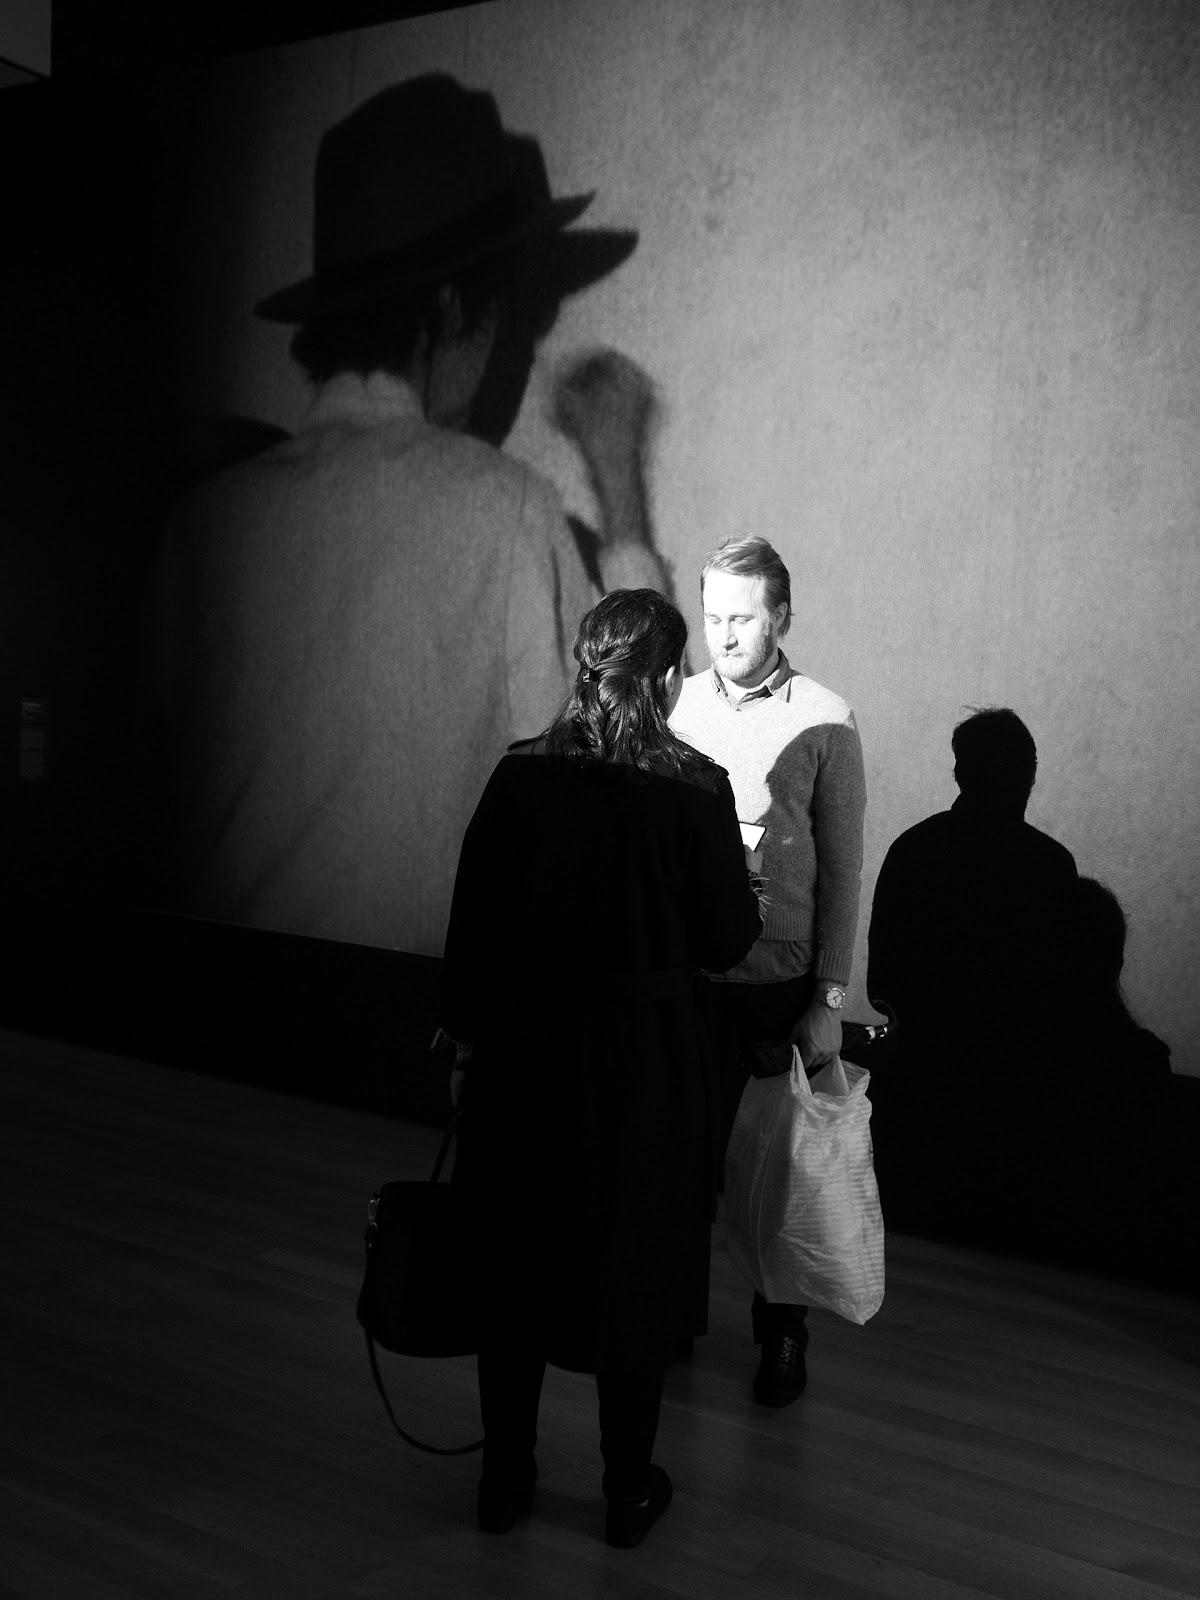 Stranger Portraits #StrangerPortraits #makeportraits #MoMA #MuseumofModernArt   #NYC ©2015 Nancy Lundebjerg